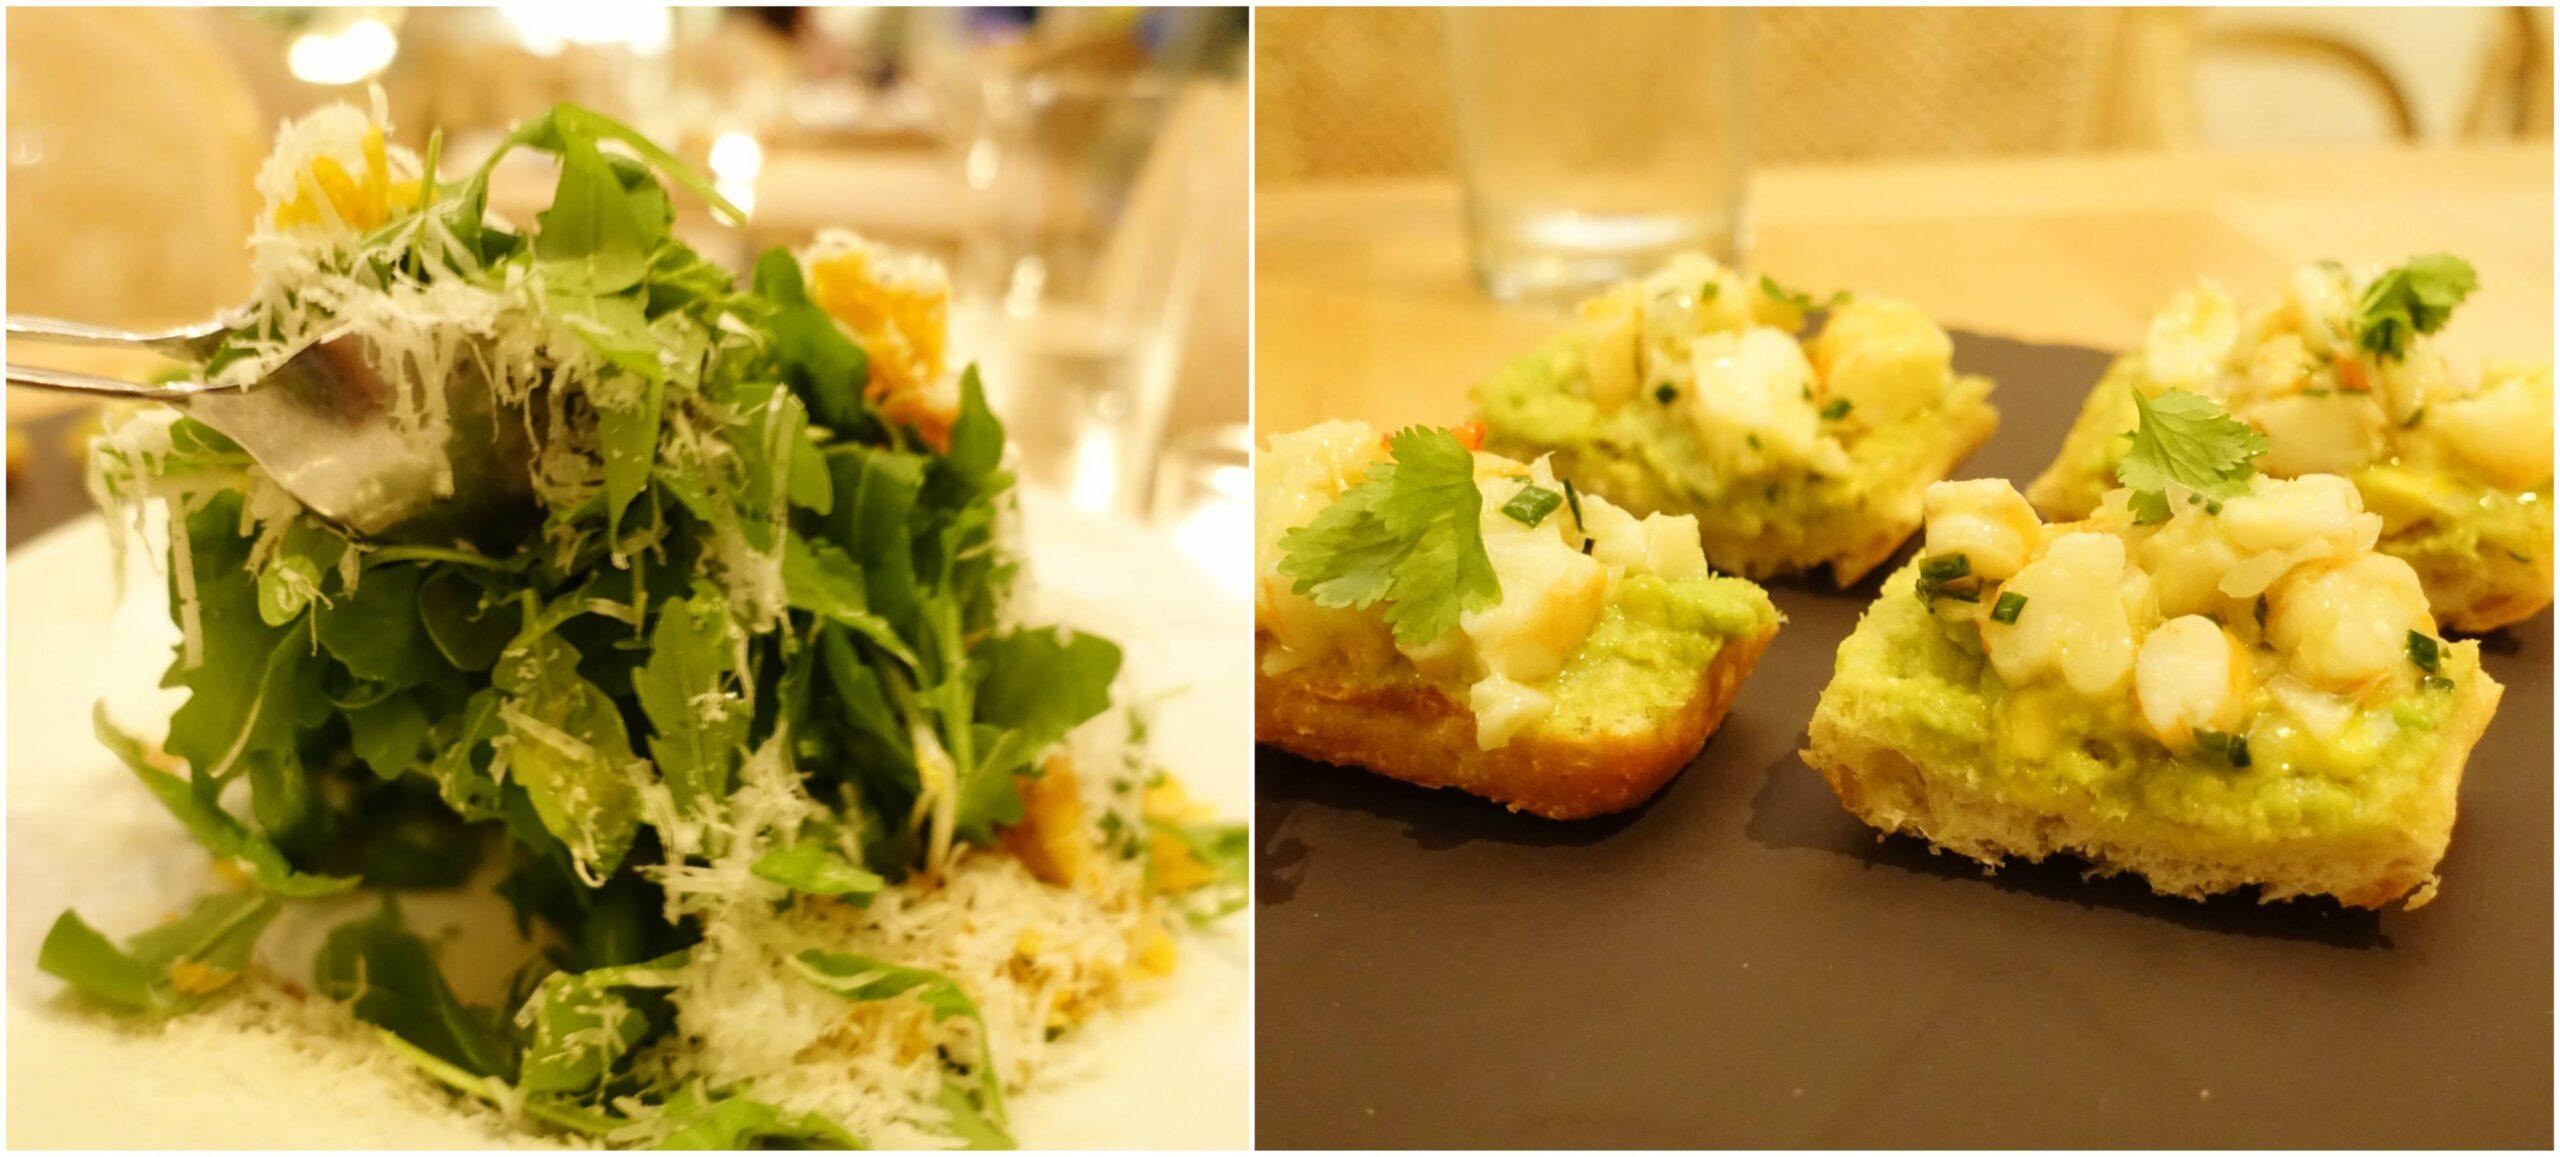 Arugula Salad, Shrimp Avocado Tartine - Ola Ocean Front Bistro, San Juan, Puerto Rico